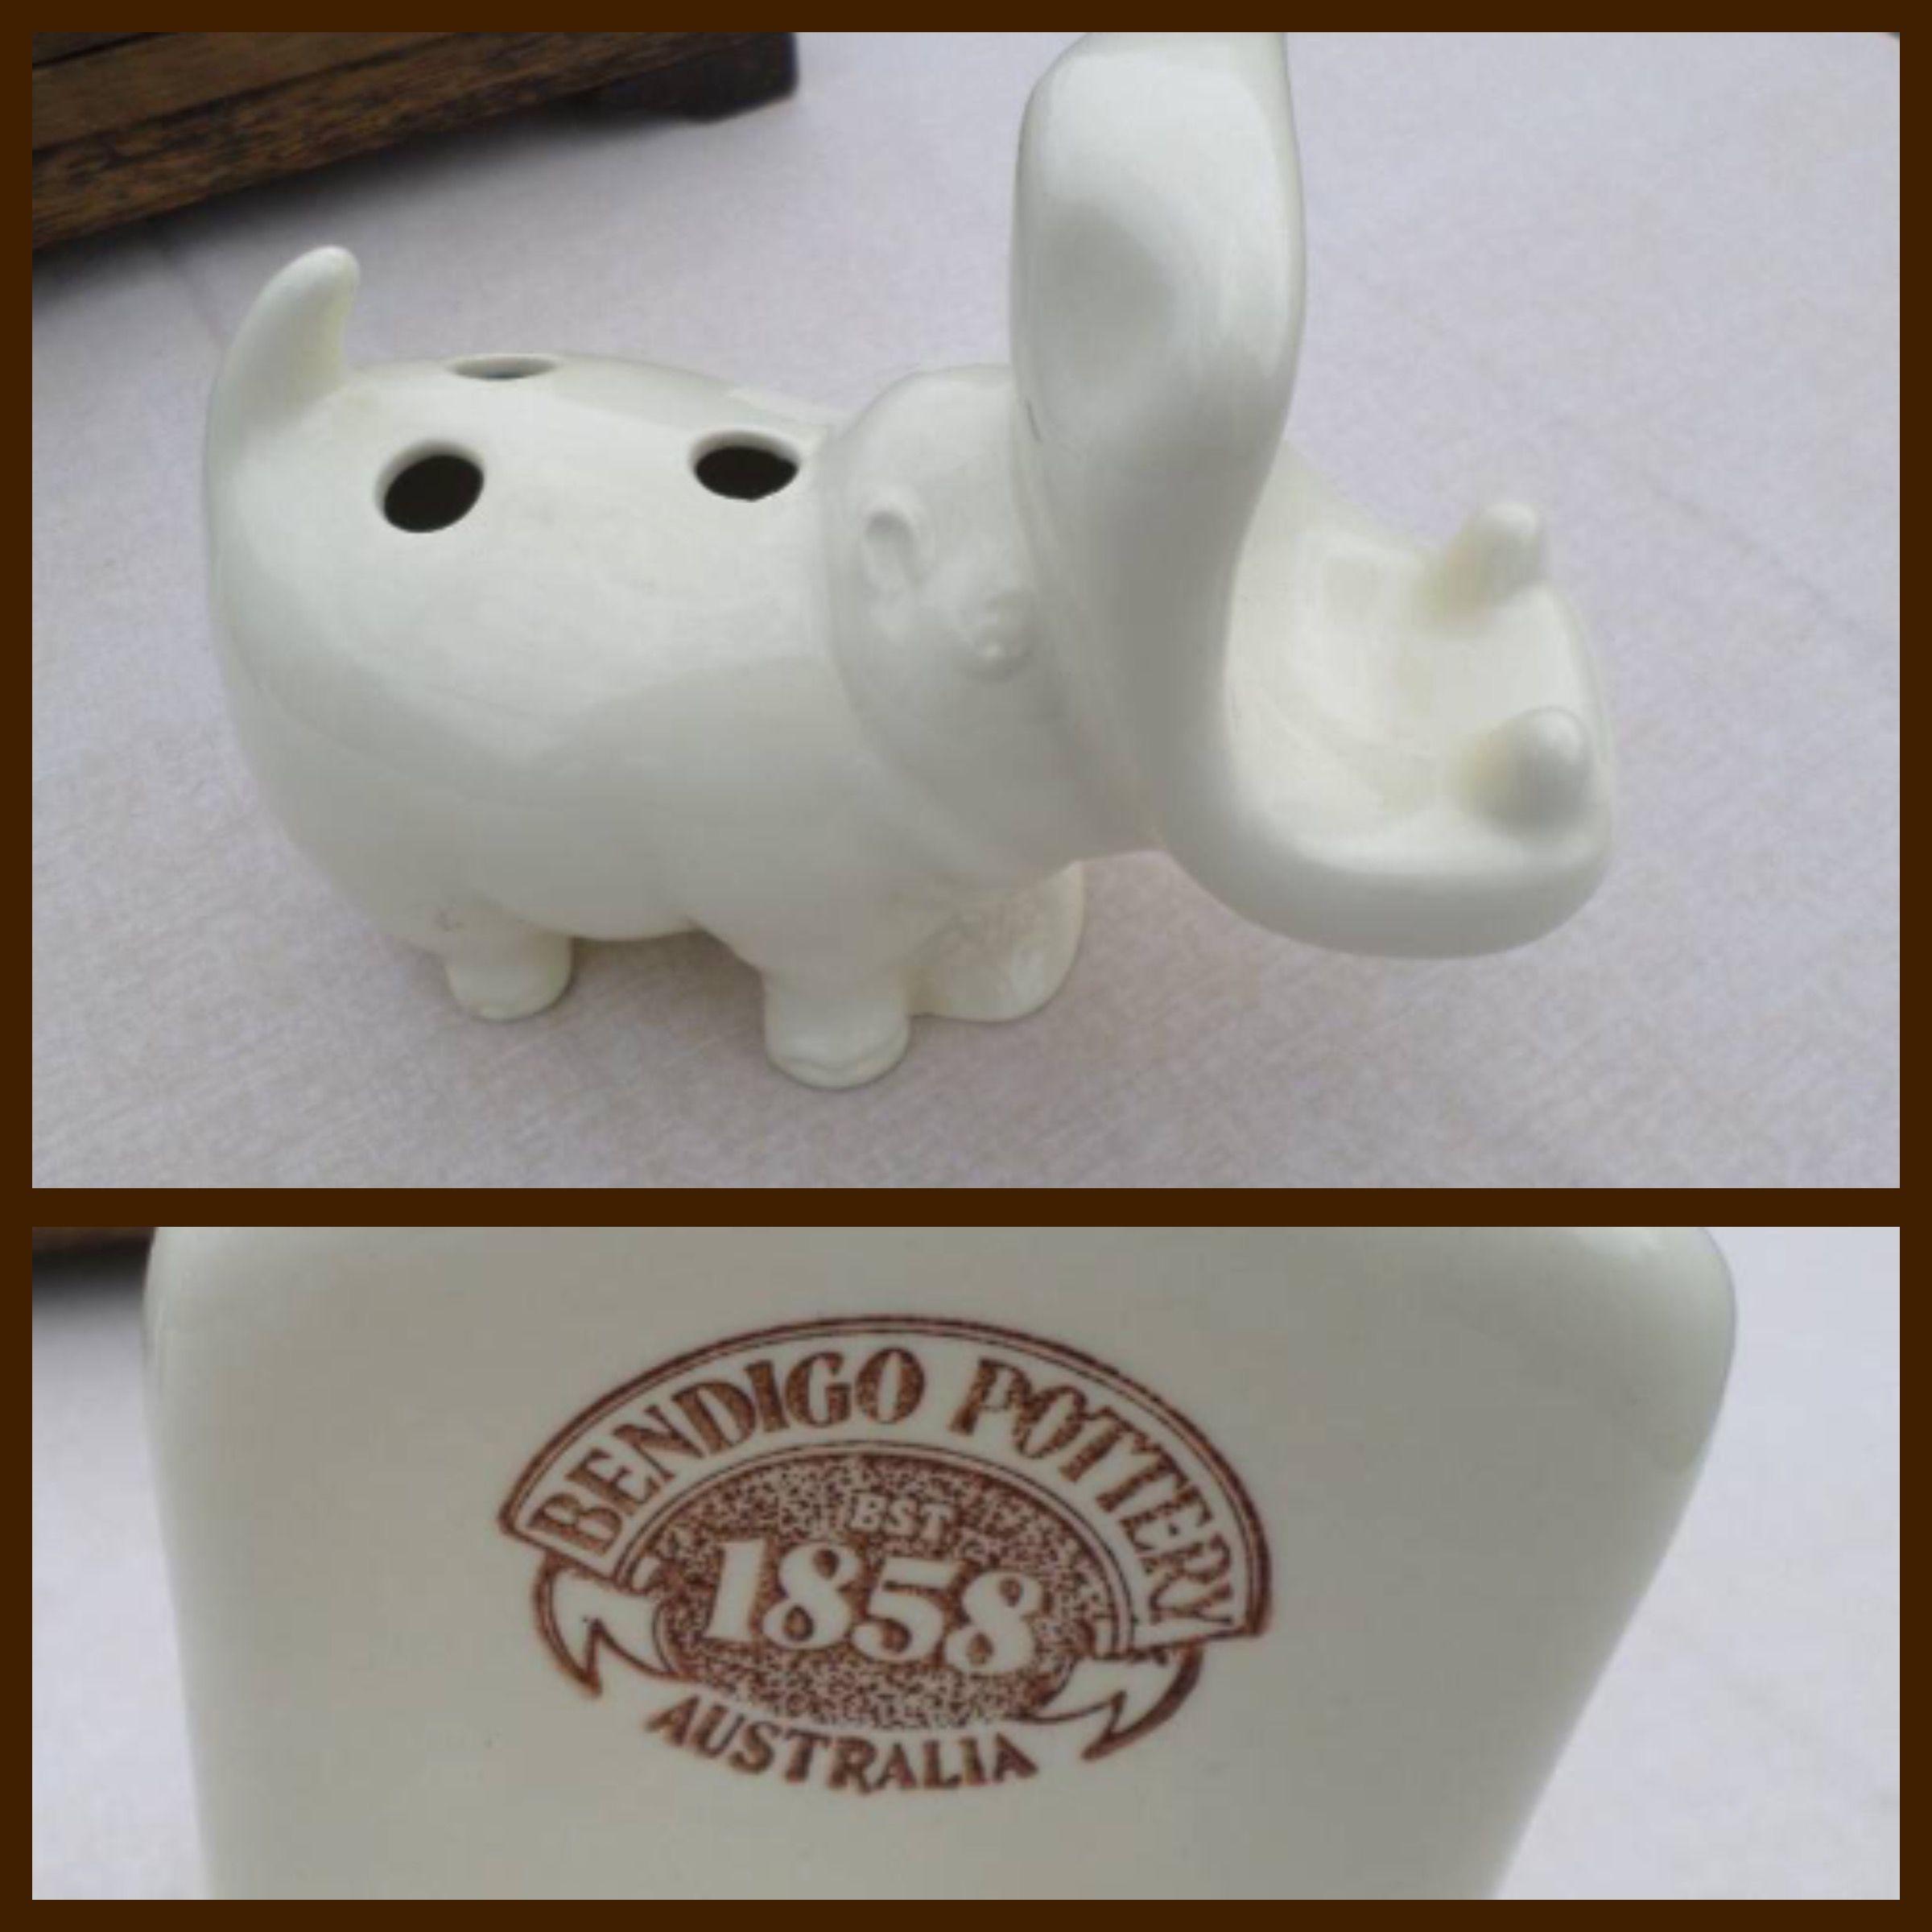 Bendigo Pottery Hippopotamus Toothbrush Holder (With